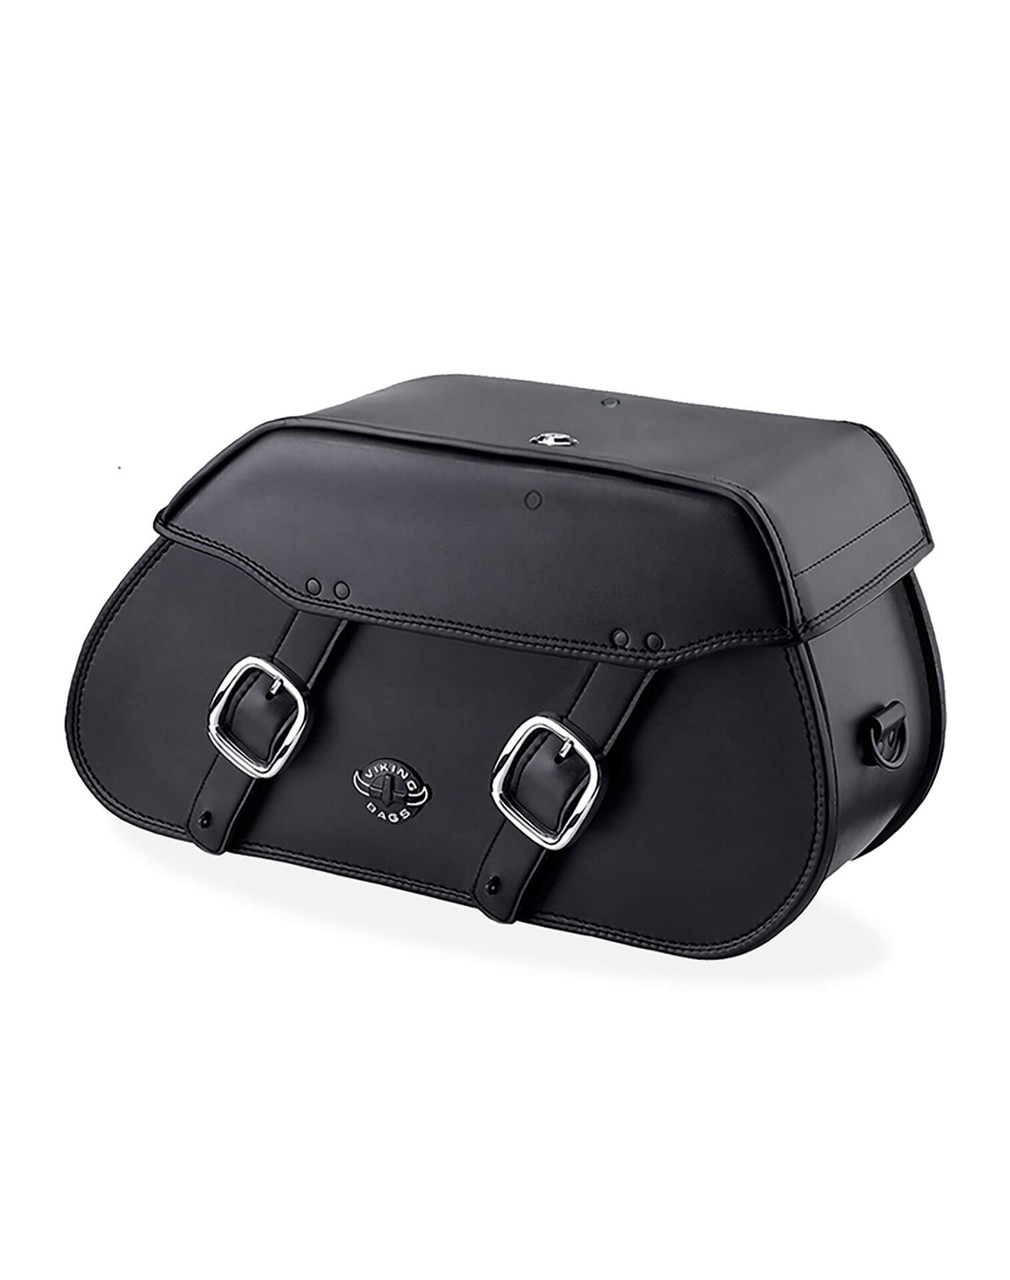 Honda 1500 Valkyrie Standard Pinnacle Motorcycle saddlebags Main View